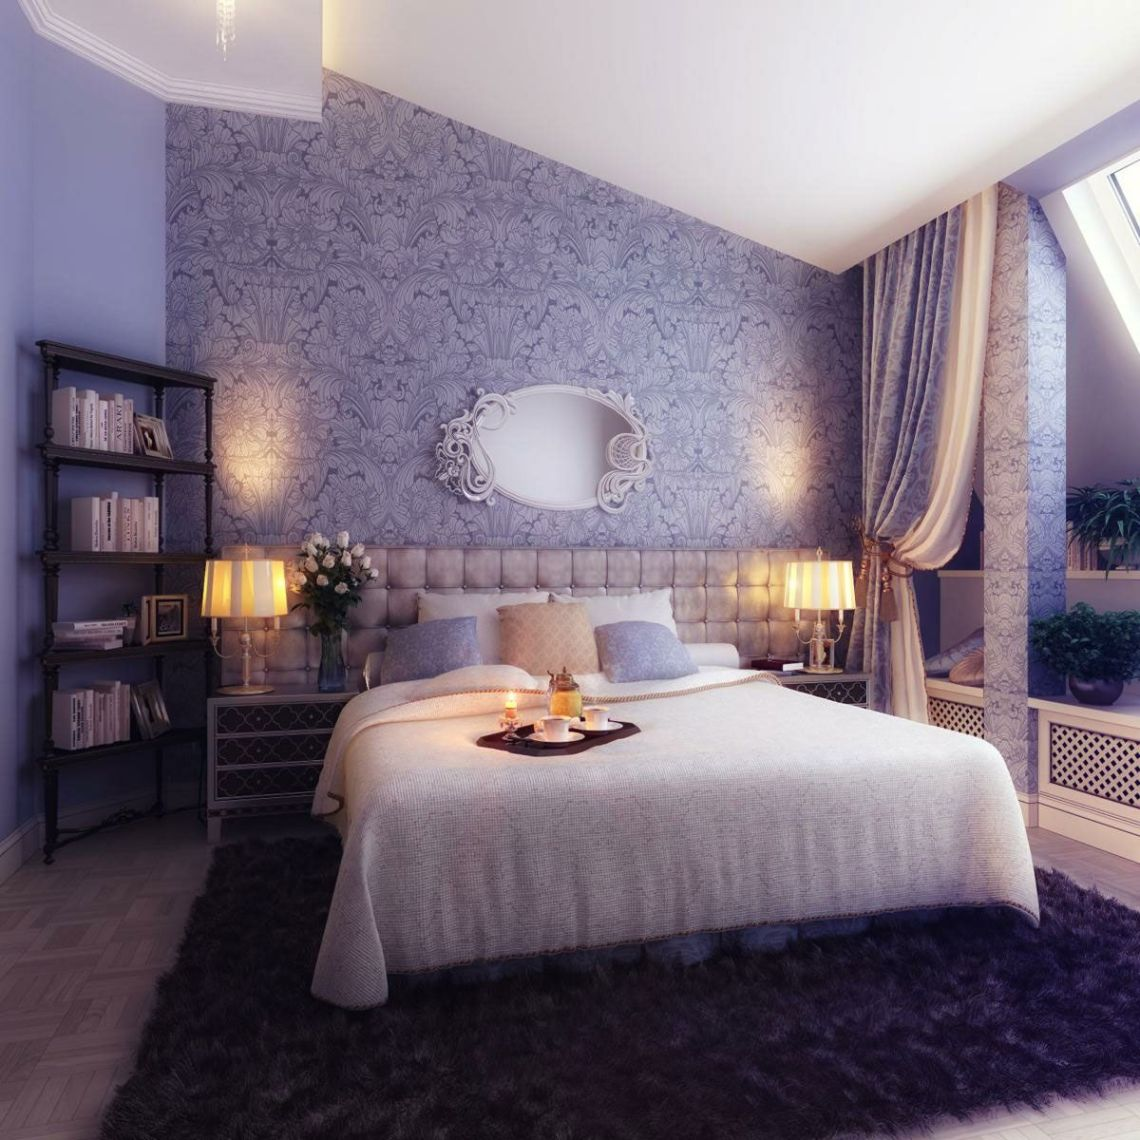 Master Bedroom Romantic Bedroom Wallpaper Designs